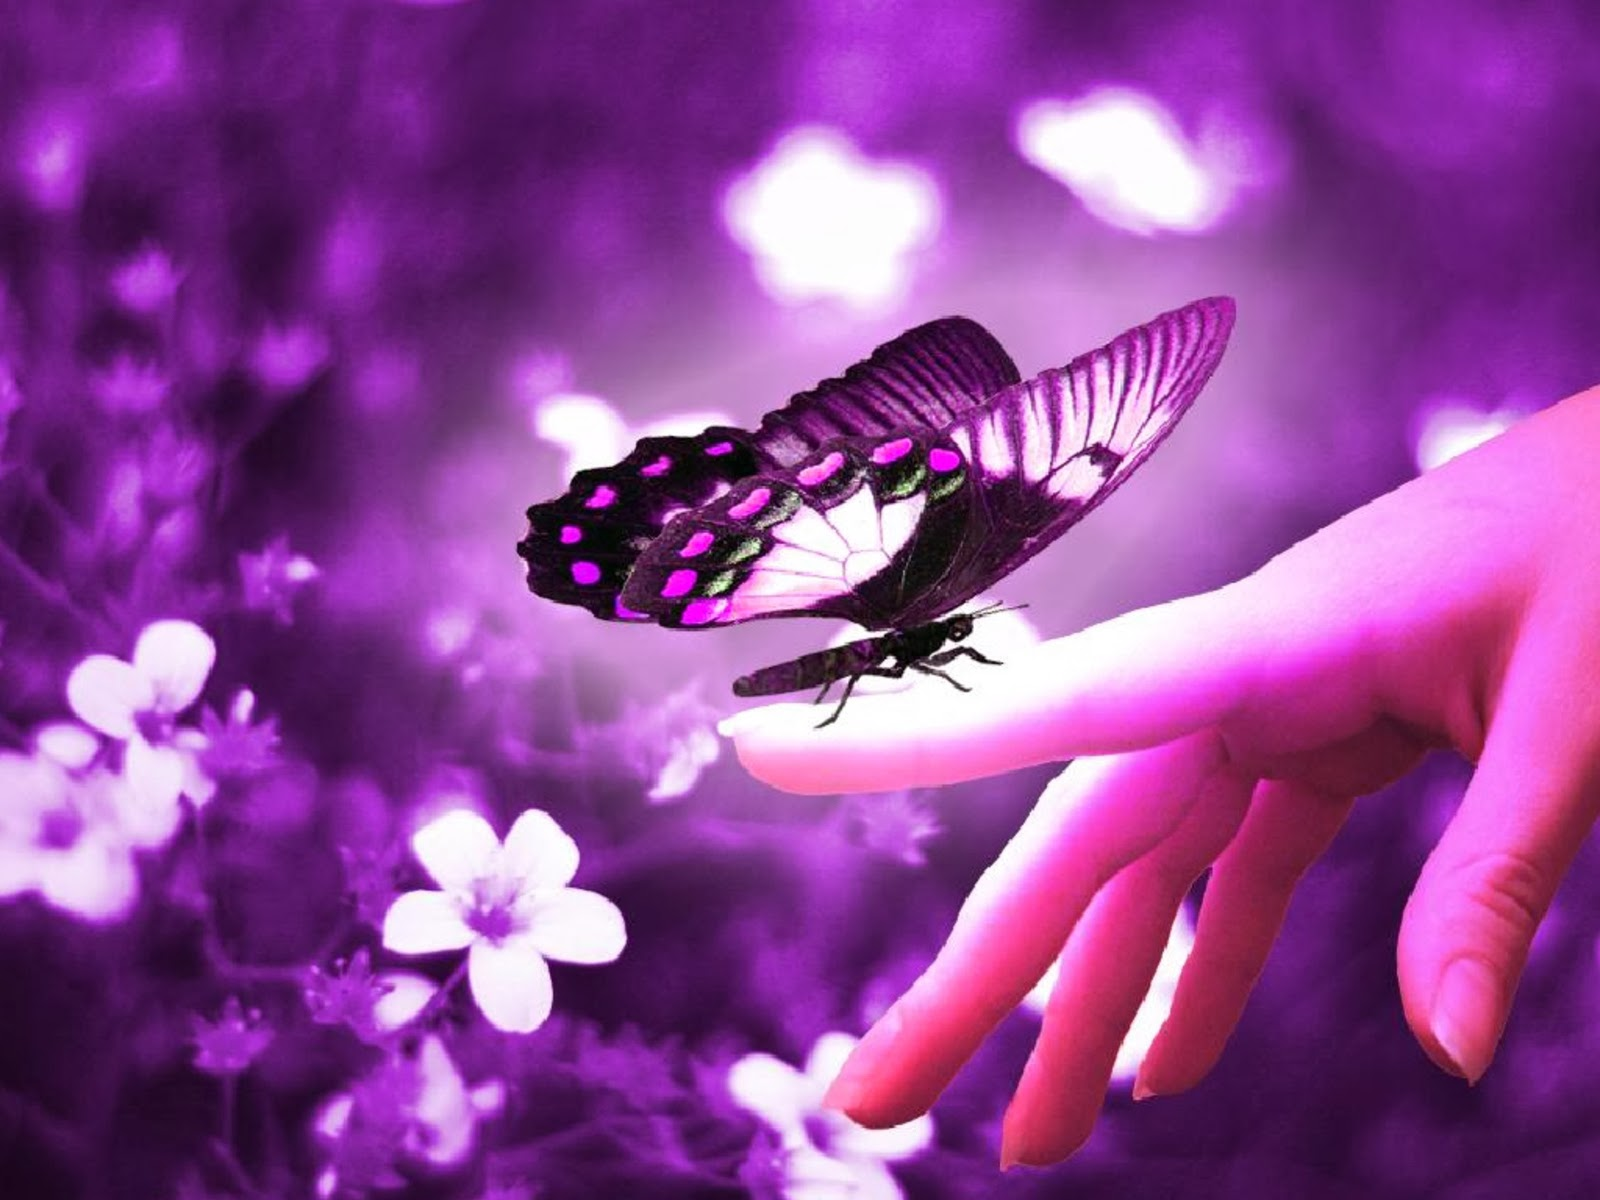 mengagumkan-kupu-kupu-hd-gambar-fullscren